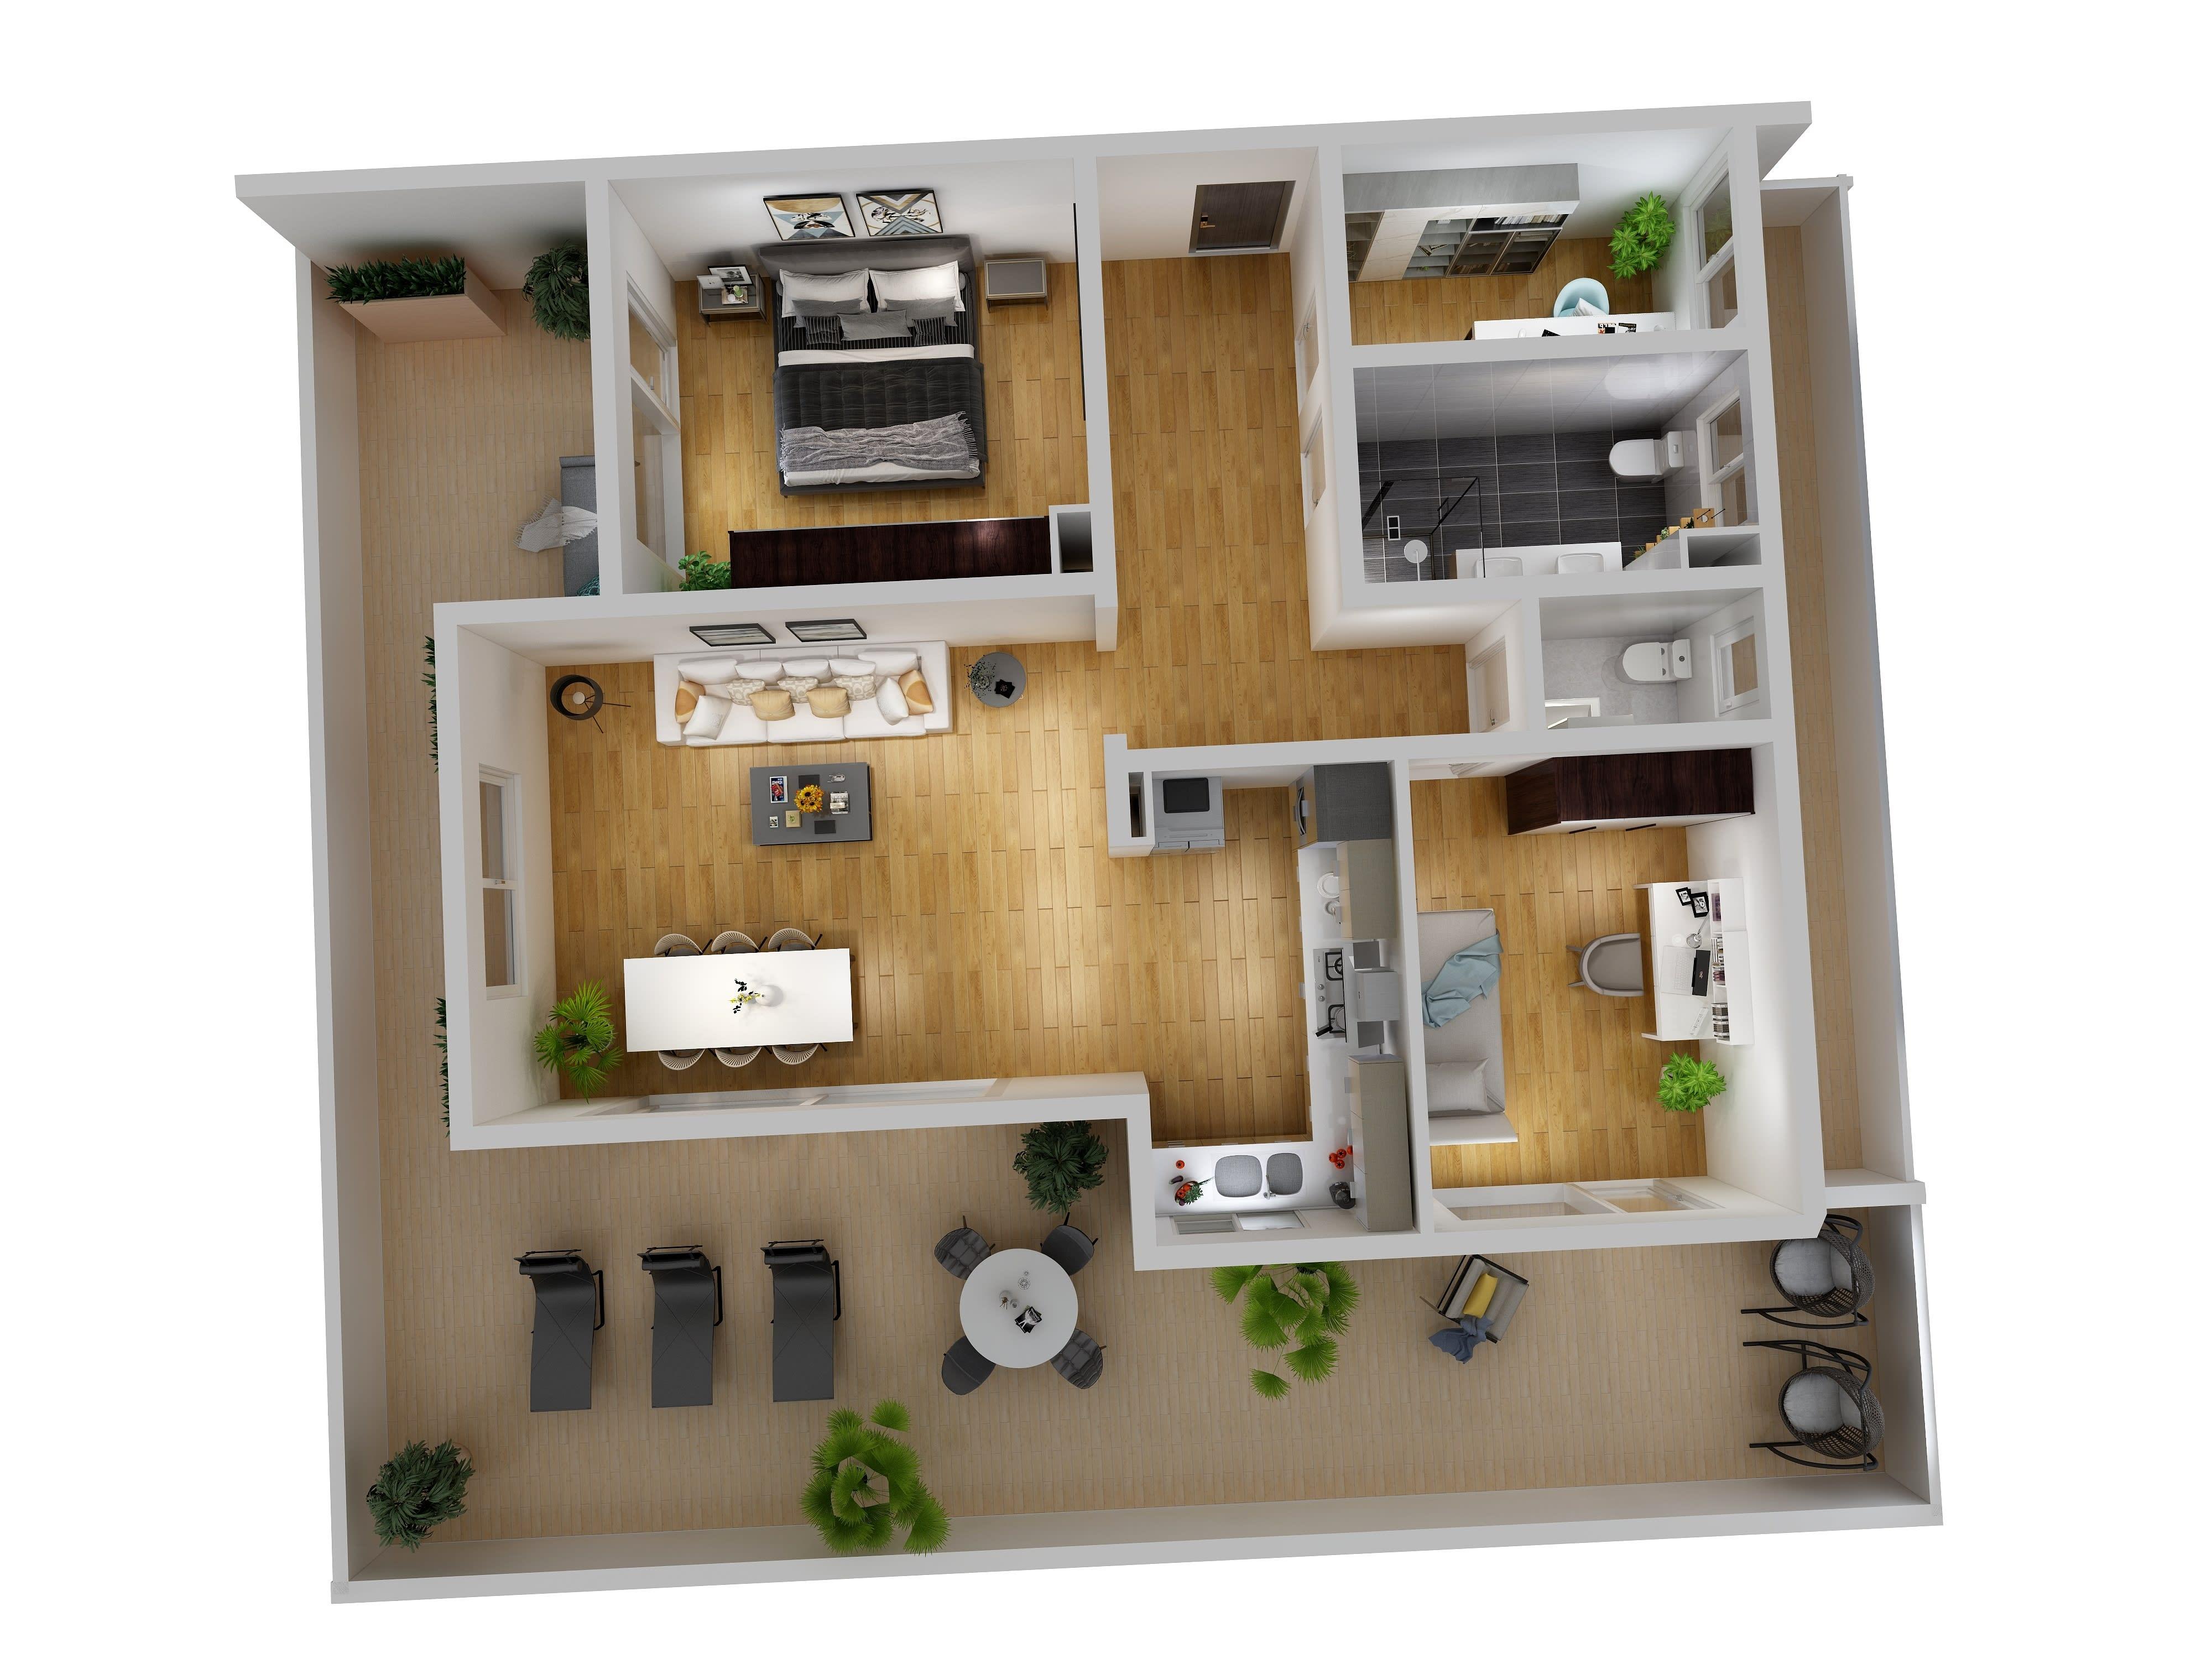 Create A 3d Walkthrough Animation From 2d Floor Plan By Geronimo17 Fiverr